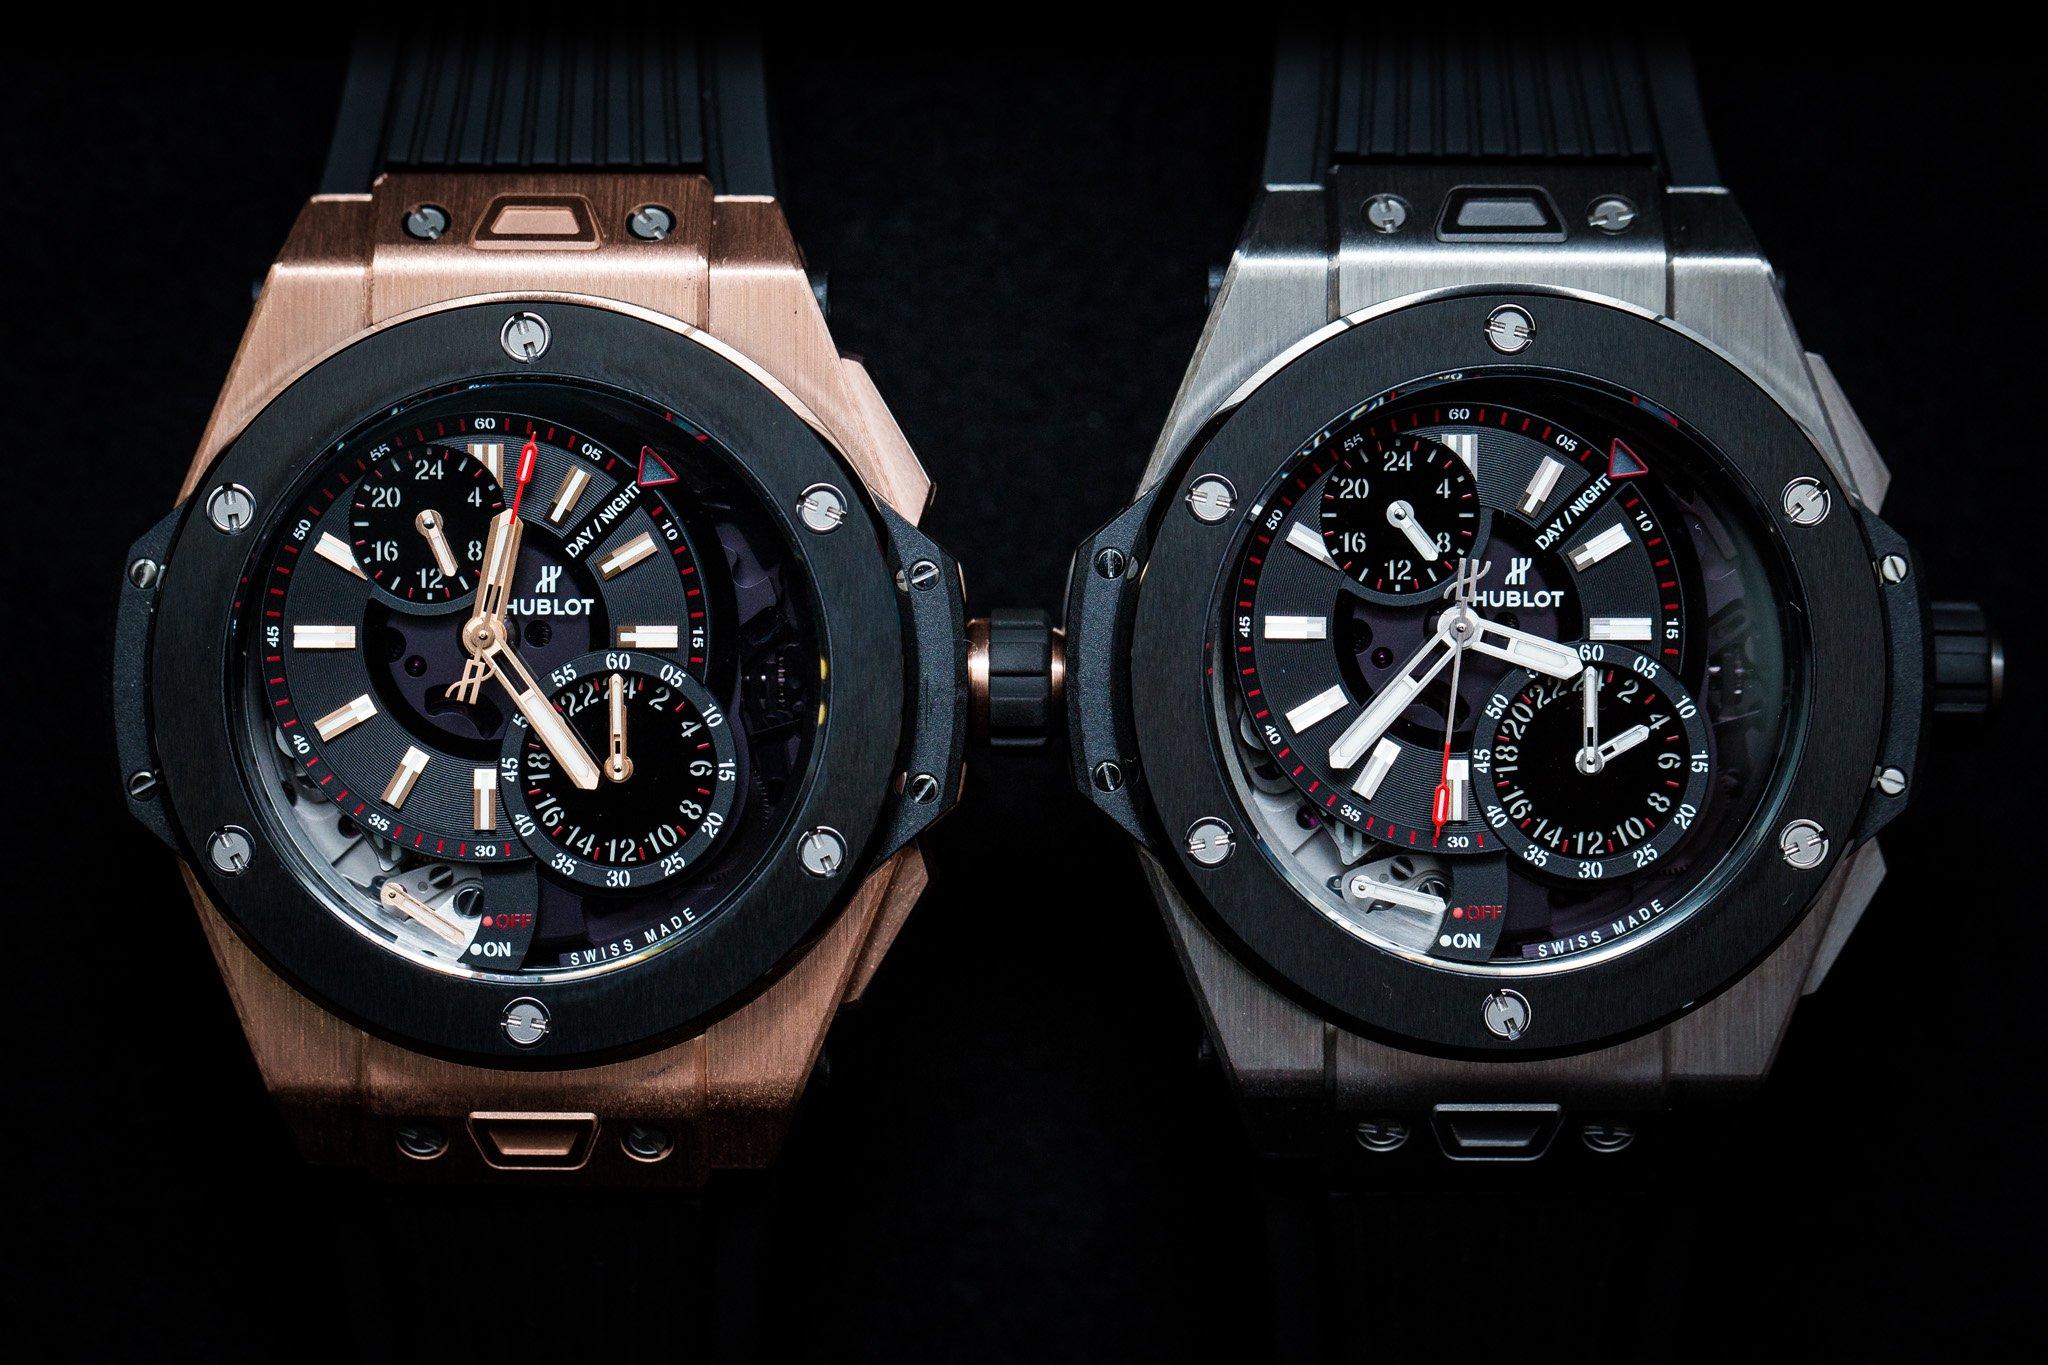 Hublot-Big-Bang-Alarm-Repeater-Watch-in-King-Gold-And-Titanium1